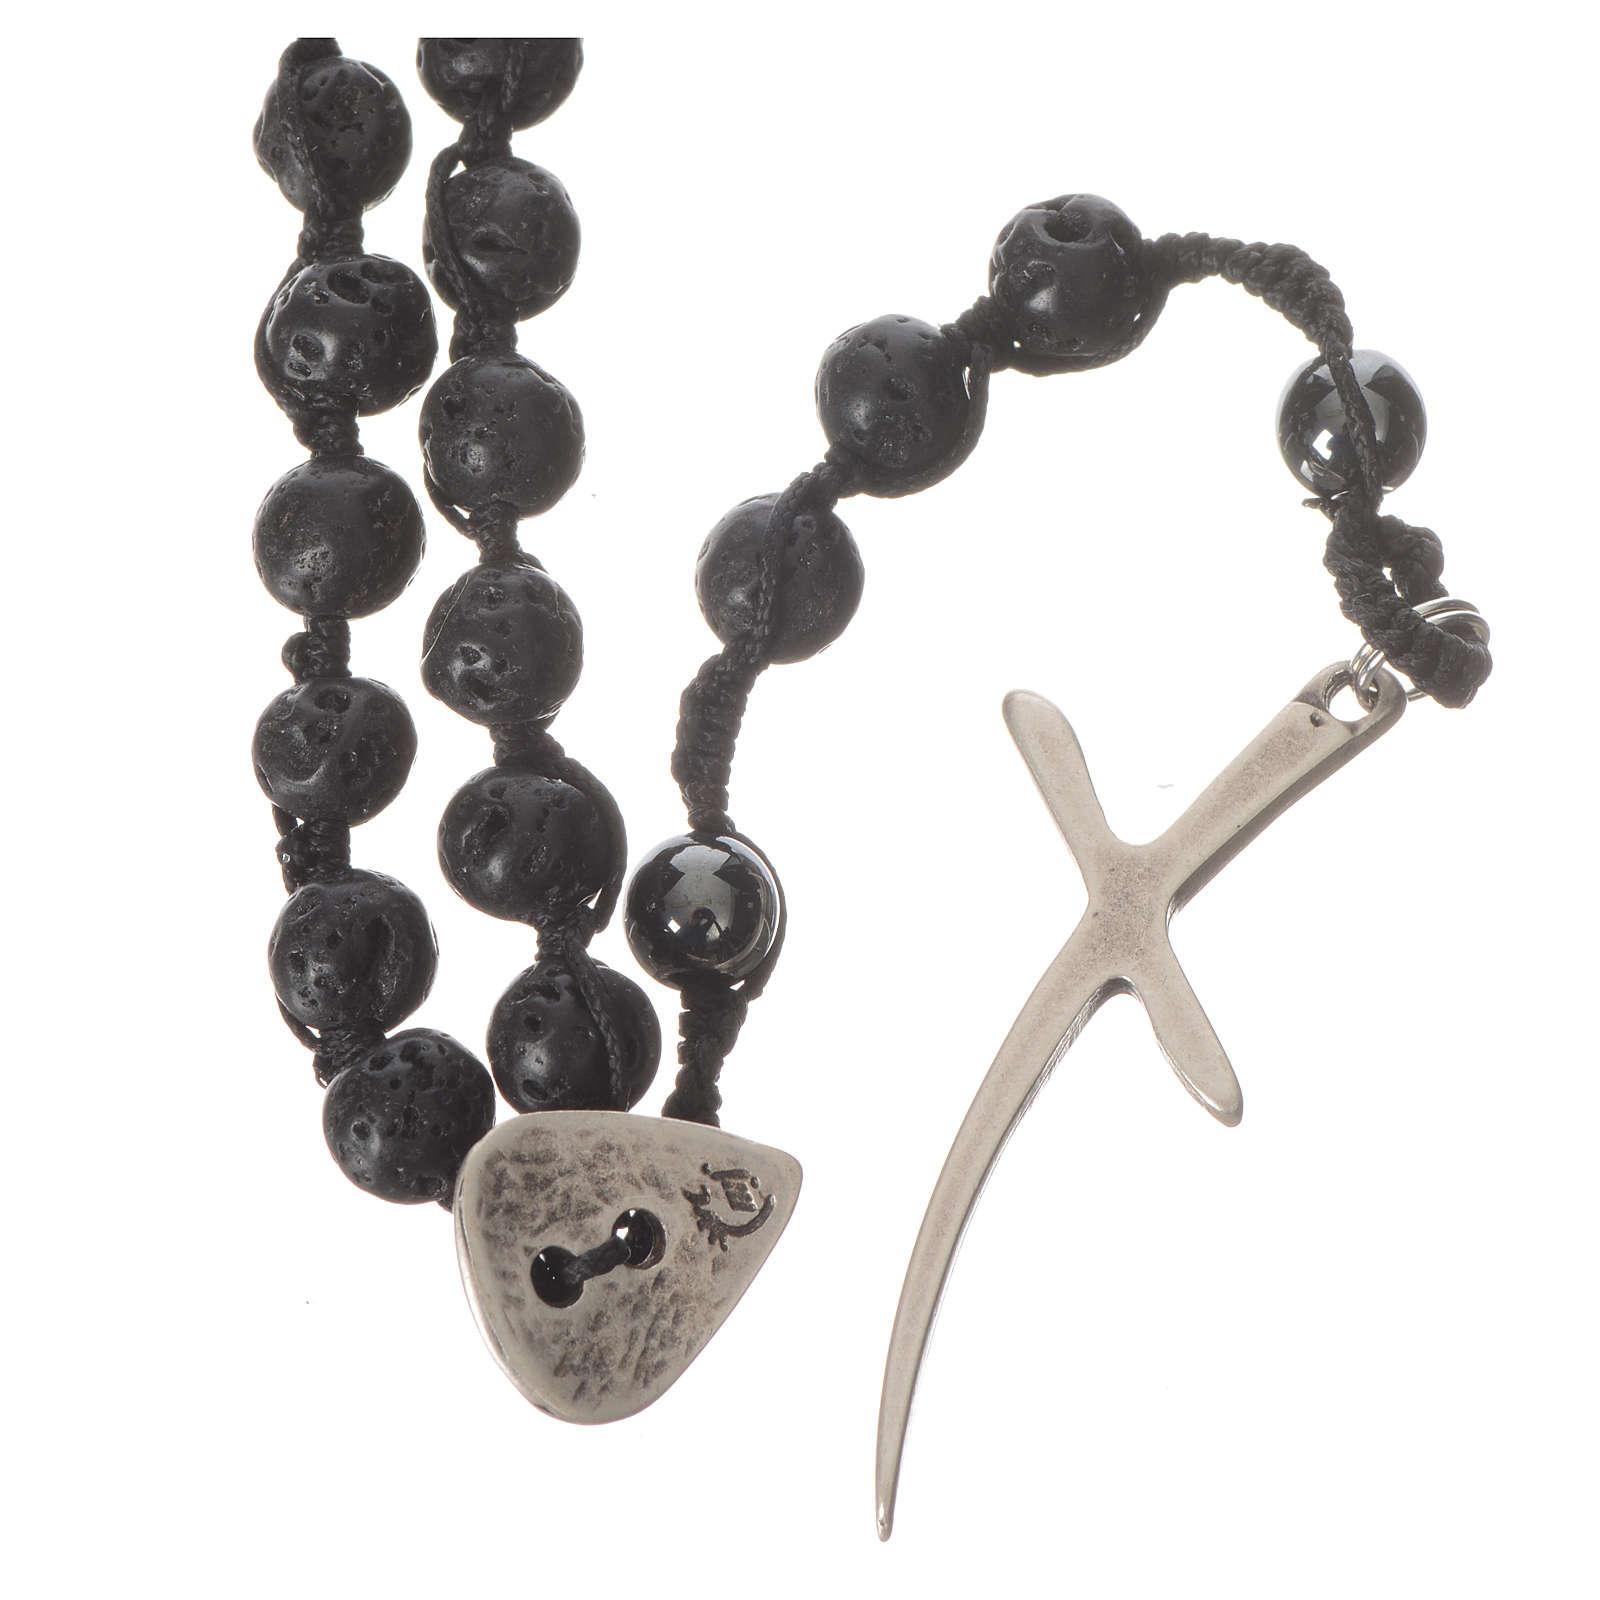 Collana Rosario in pietra lavica ed ematite 6 mm 4